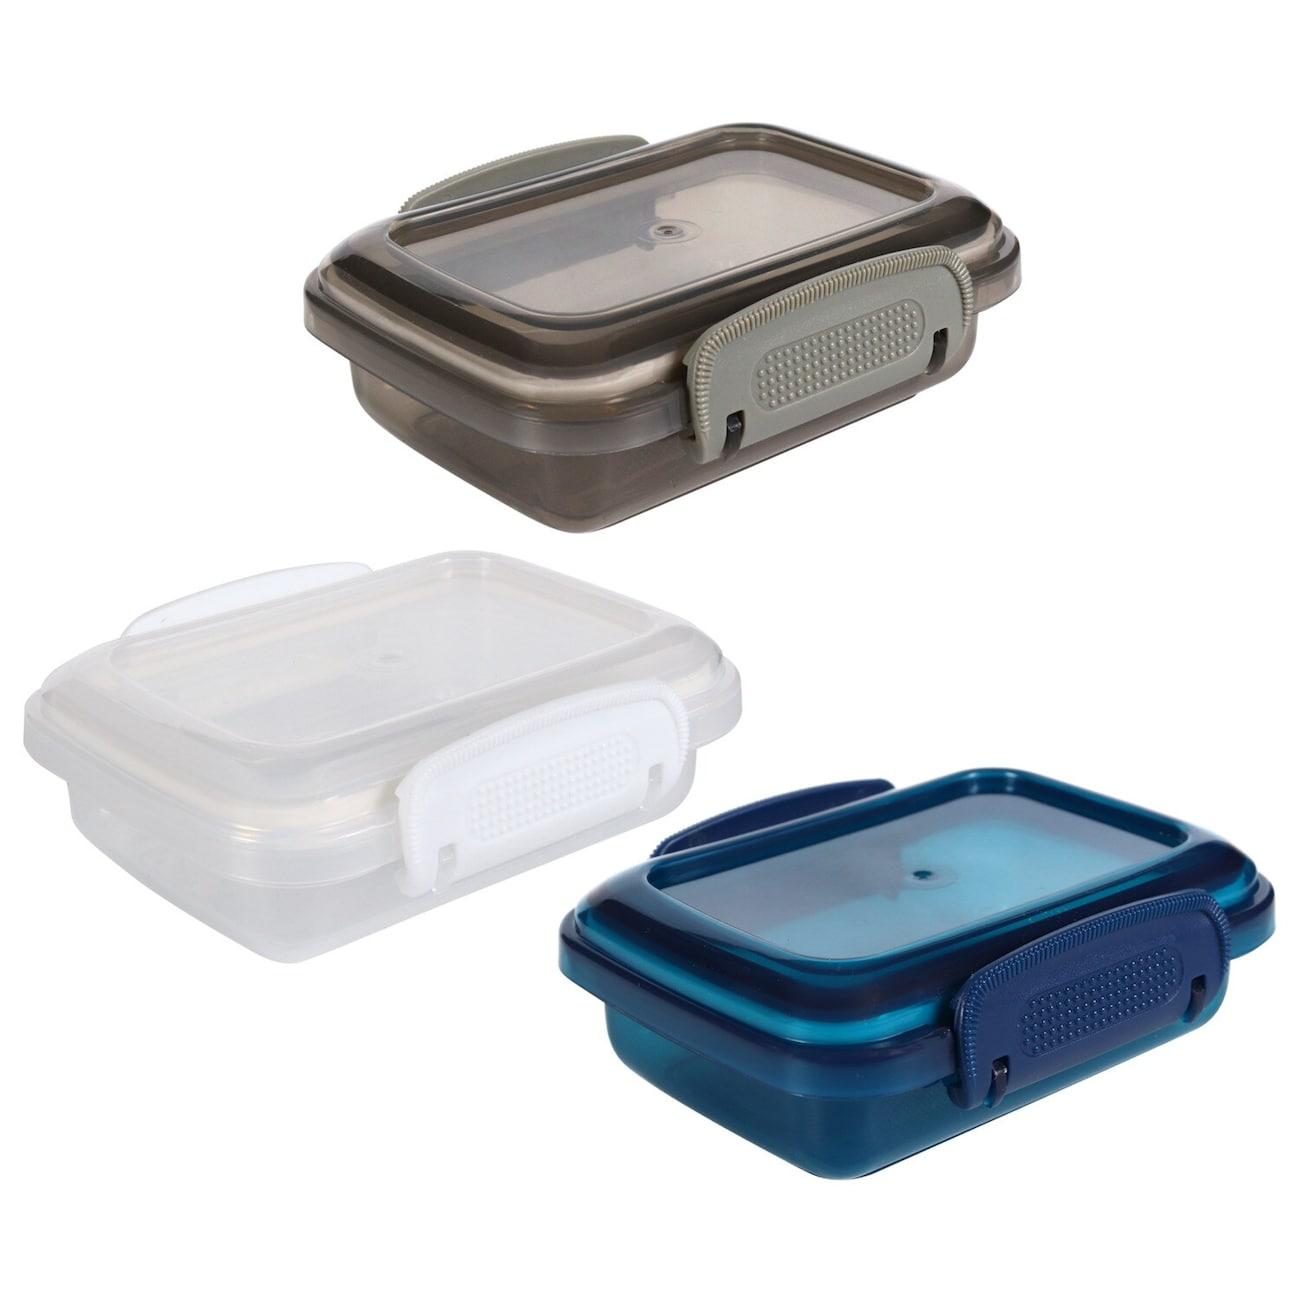 Translucent Plastic Storage Boxes with Clip-Lock Lids, 2-ct. Packs